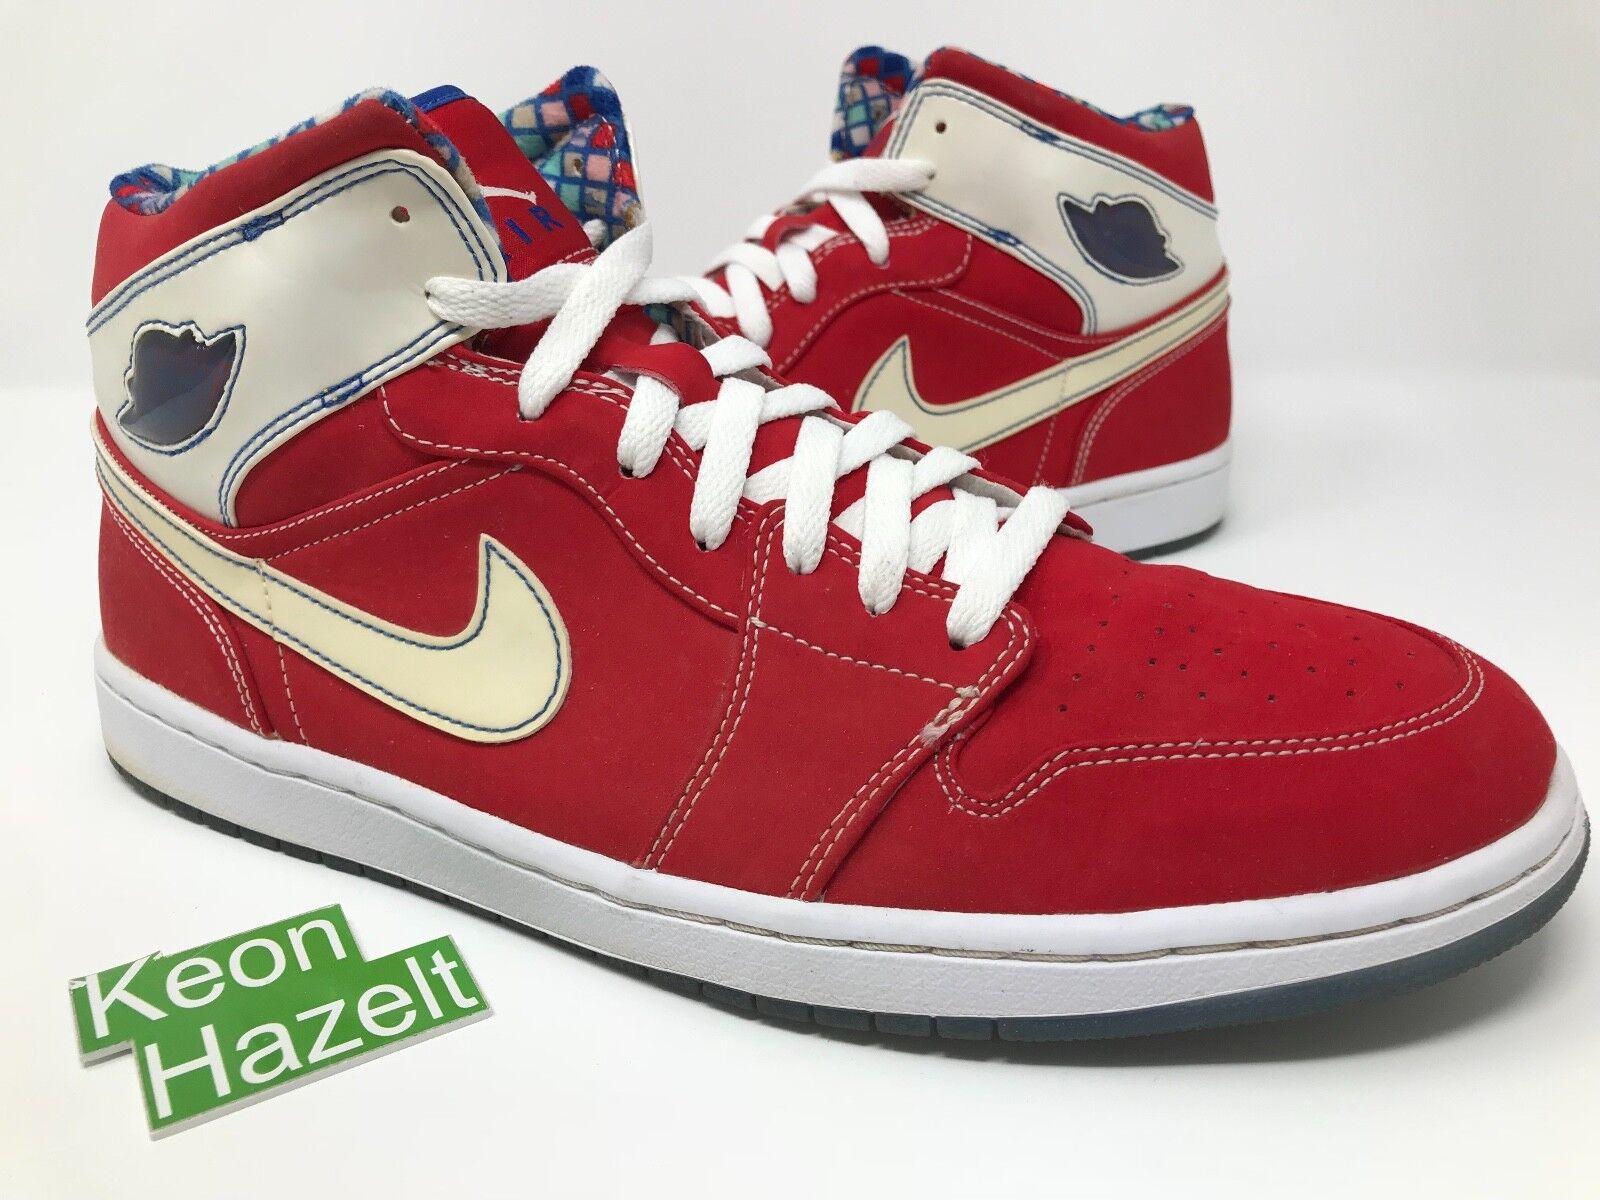 Nike Air Jordan 1 Retro LS Royal Fear Pack OVO Gamma Tgold Bred Cement Sz 13.5